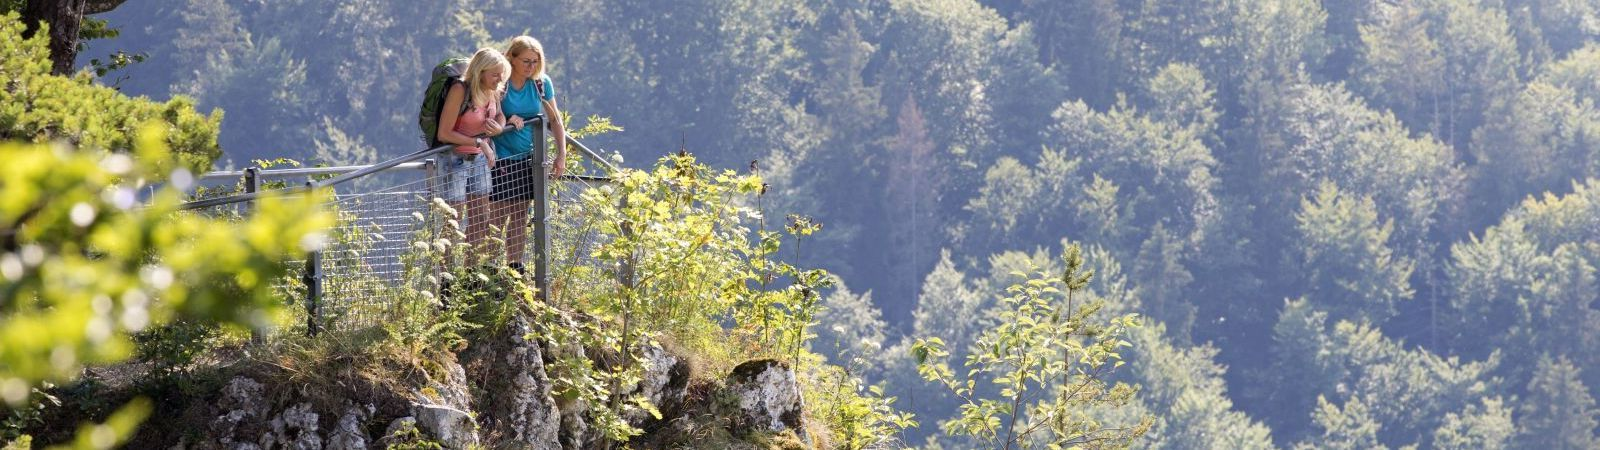 Wanderparadies Donautal